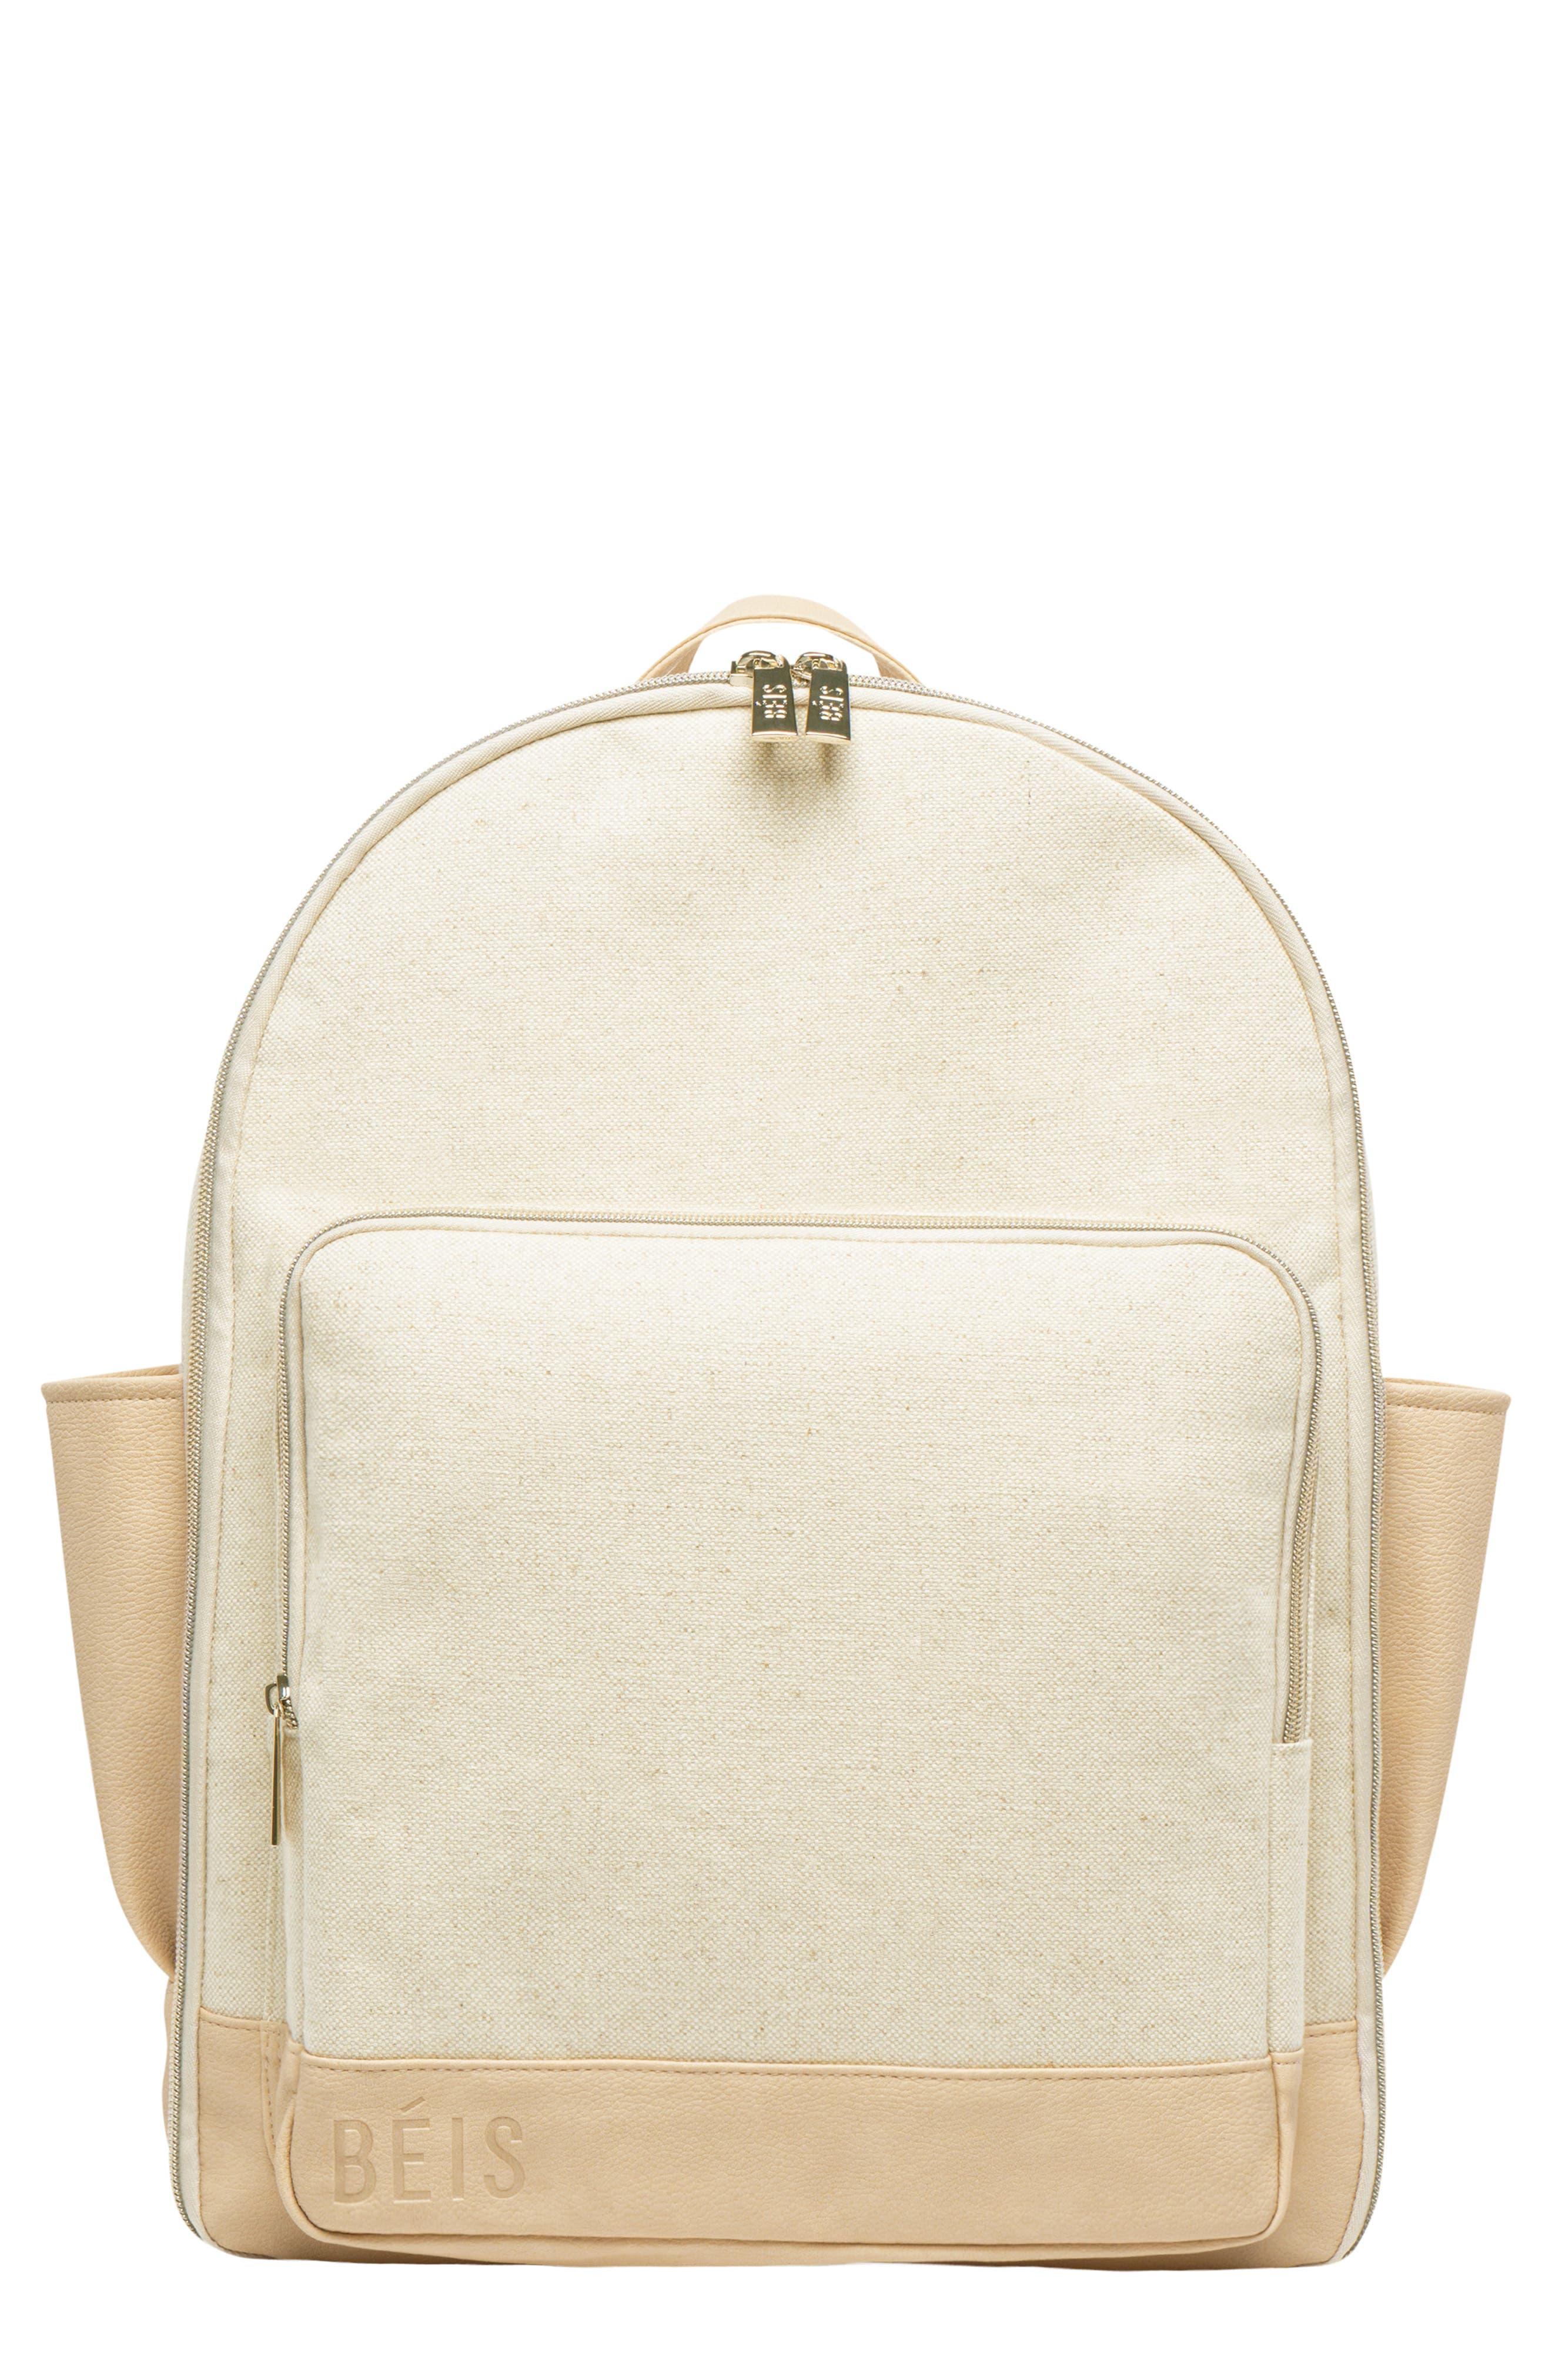 BÉIS Travel Multi Function Travel Backpack, Main, color, BEIGE